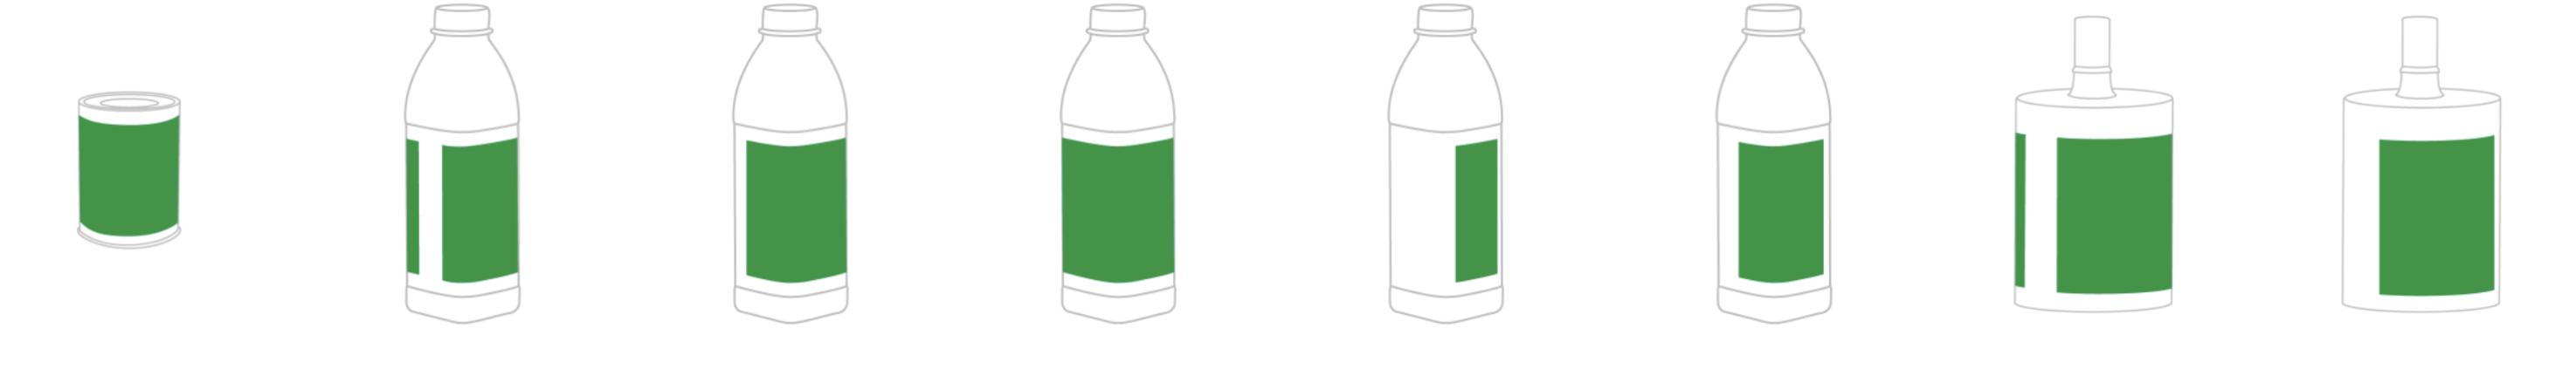 Langguth Pressure Sensitive Inline Labeler Profile